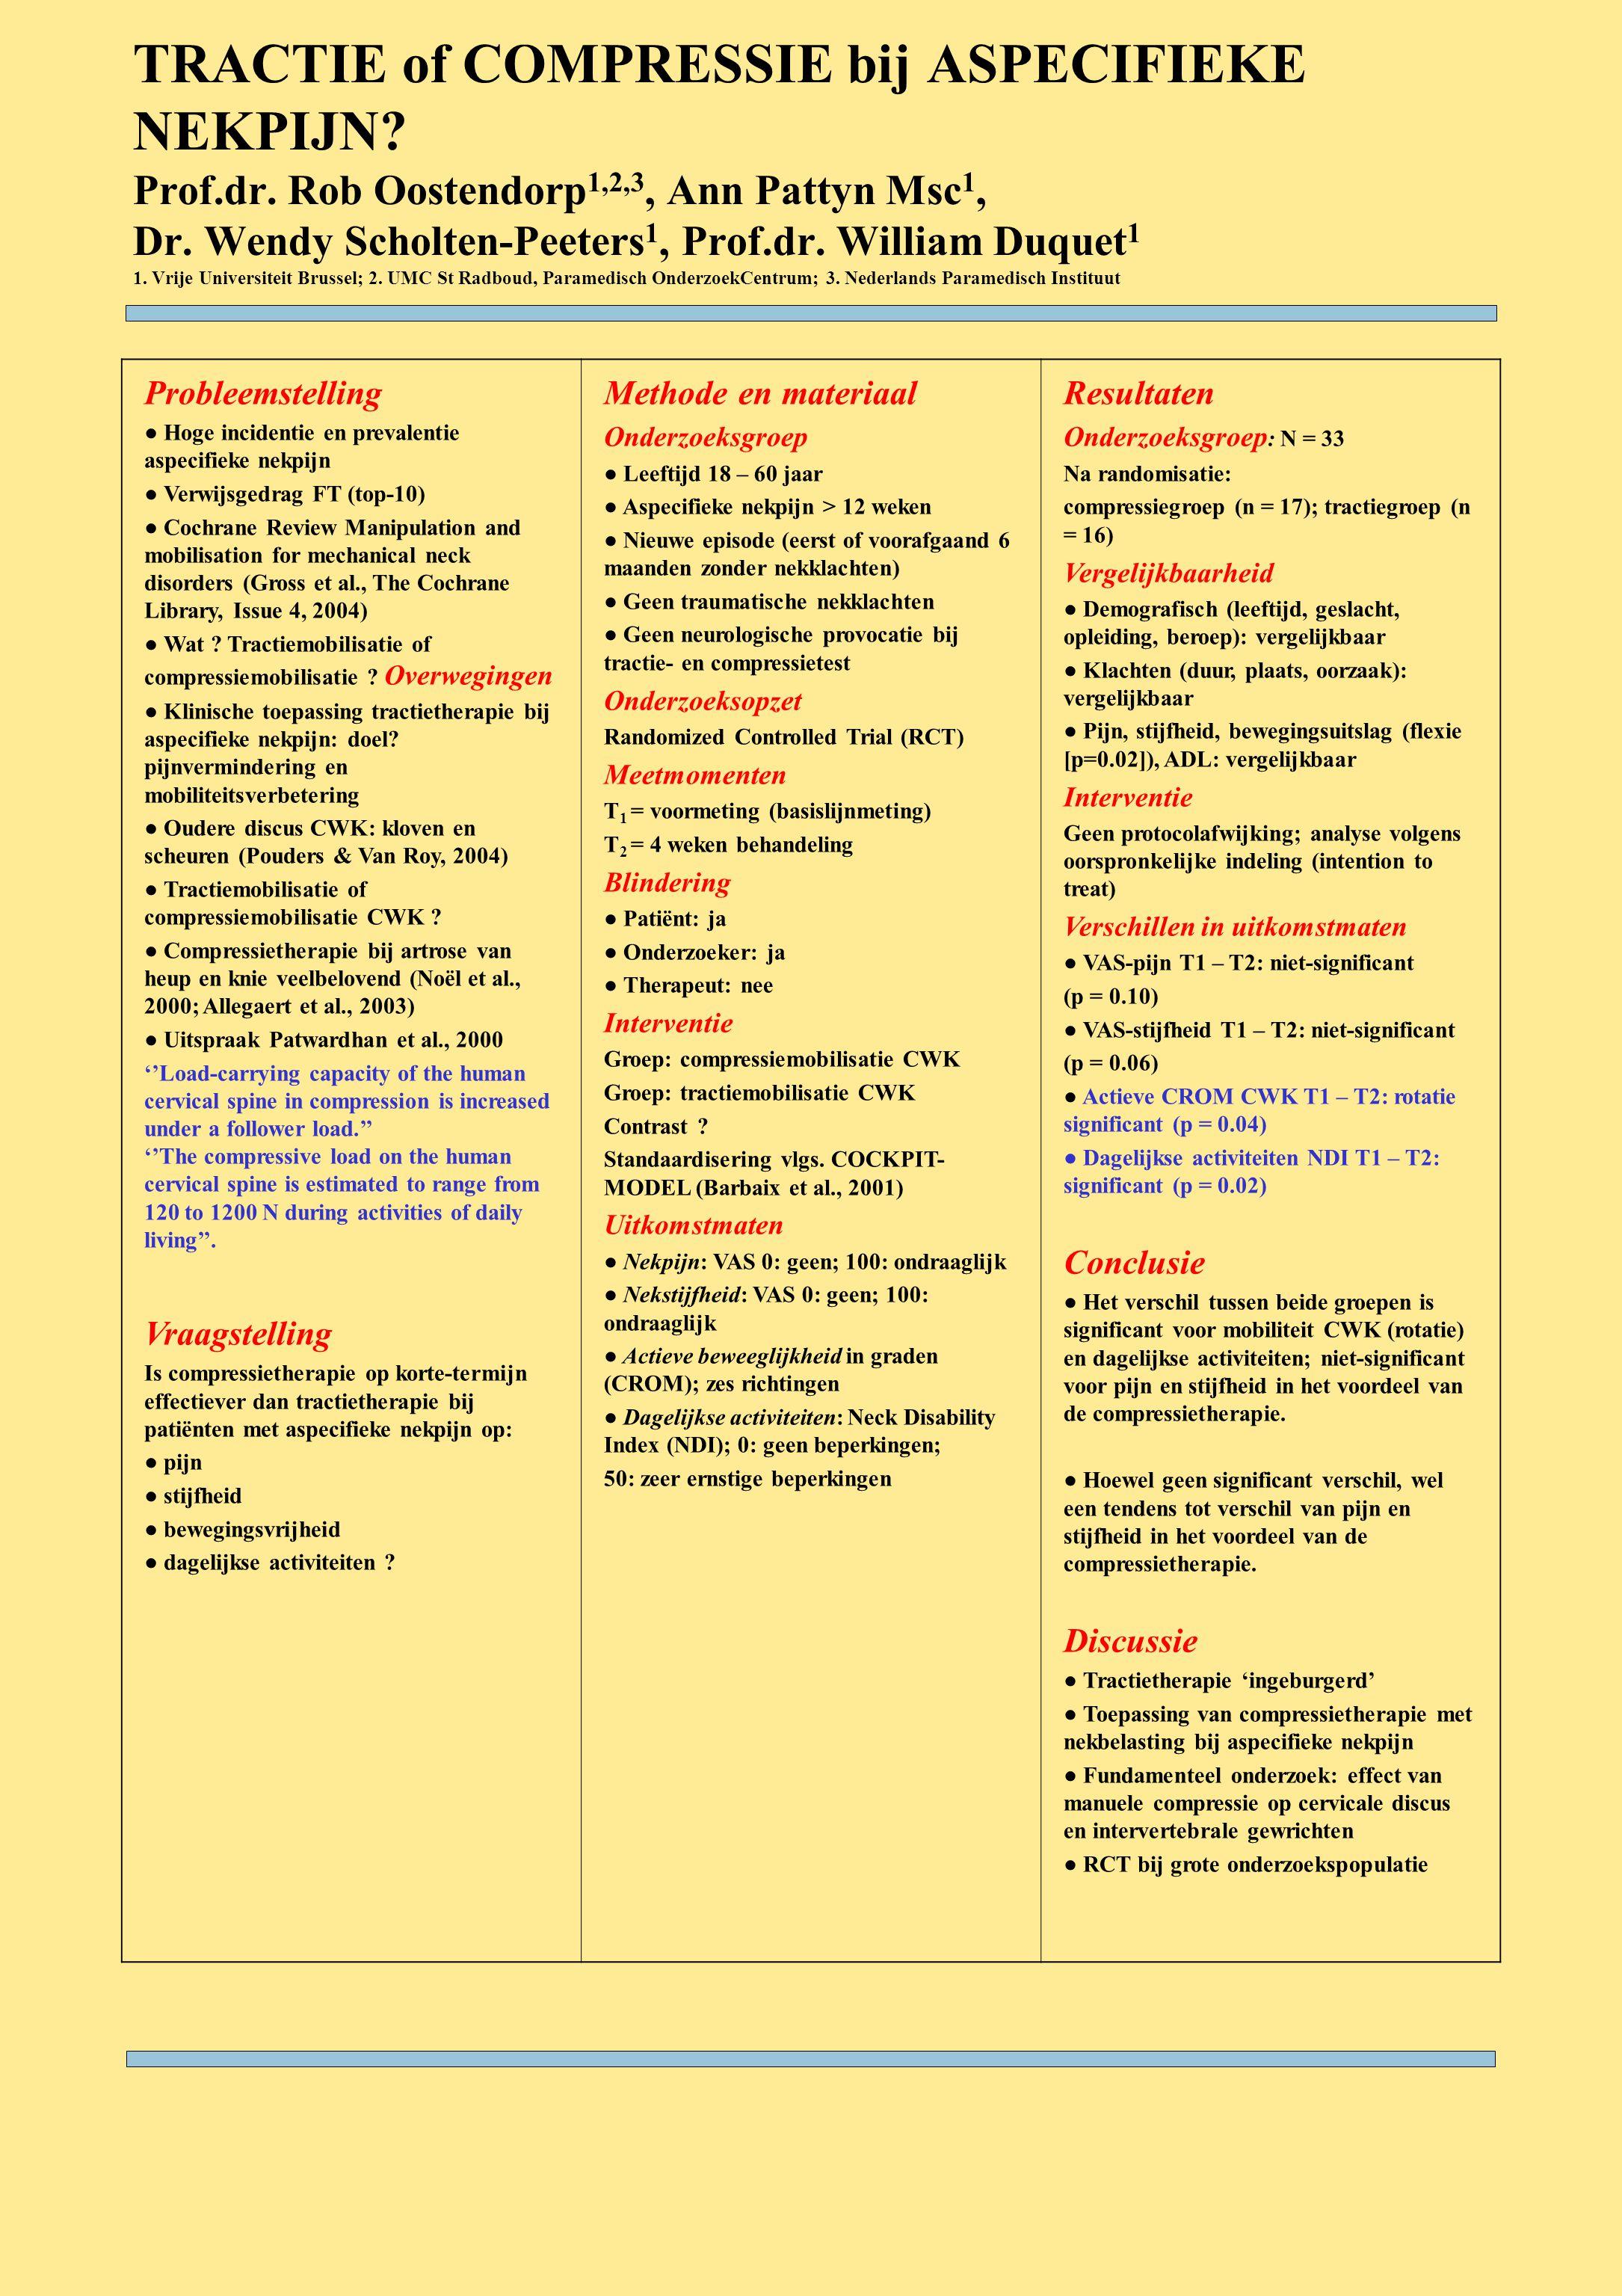 TRACTIE of COMPRESSIE bij ASPECIFIEKE NEKPIJN? Prof.dr. Rob Oostendorp 1,2,3, Ann Pattyn Msc 1, Dr. Wendy Scholten-Peeters 1, Prof.dr. William Duquet